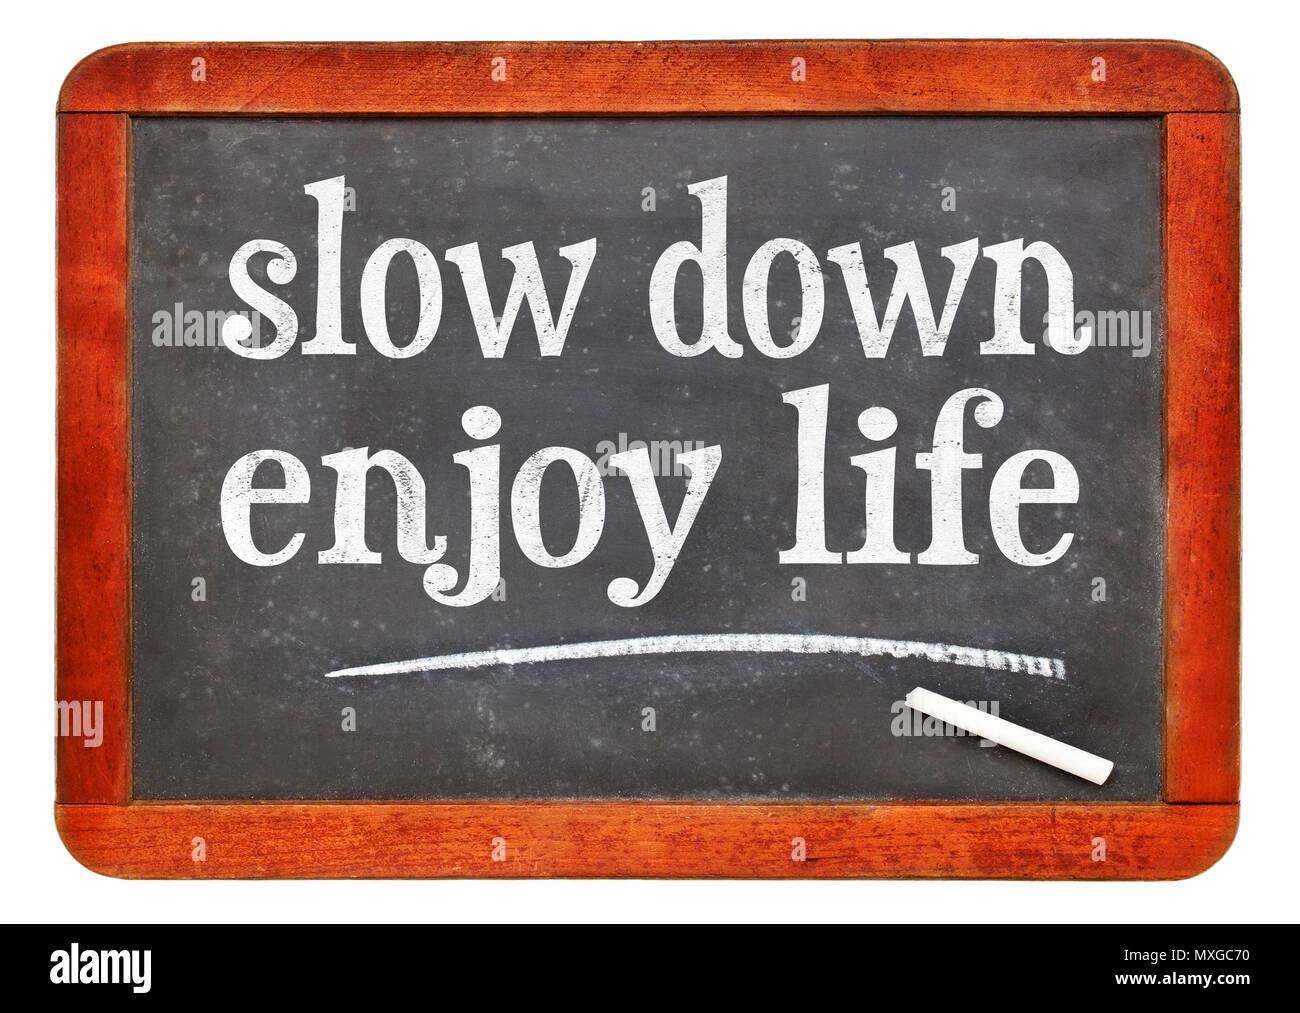 Slow down, enjoy life - white chalk text on a vintage slate blackboard Stock Photo